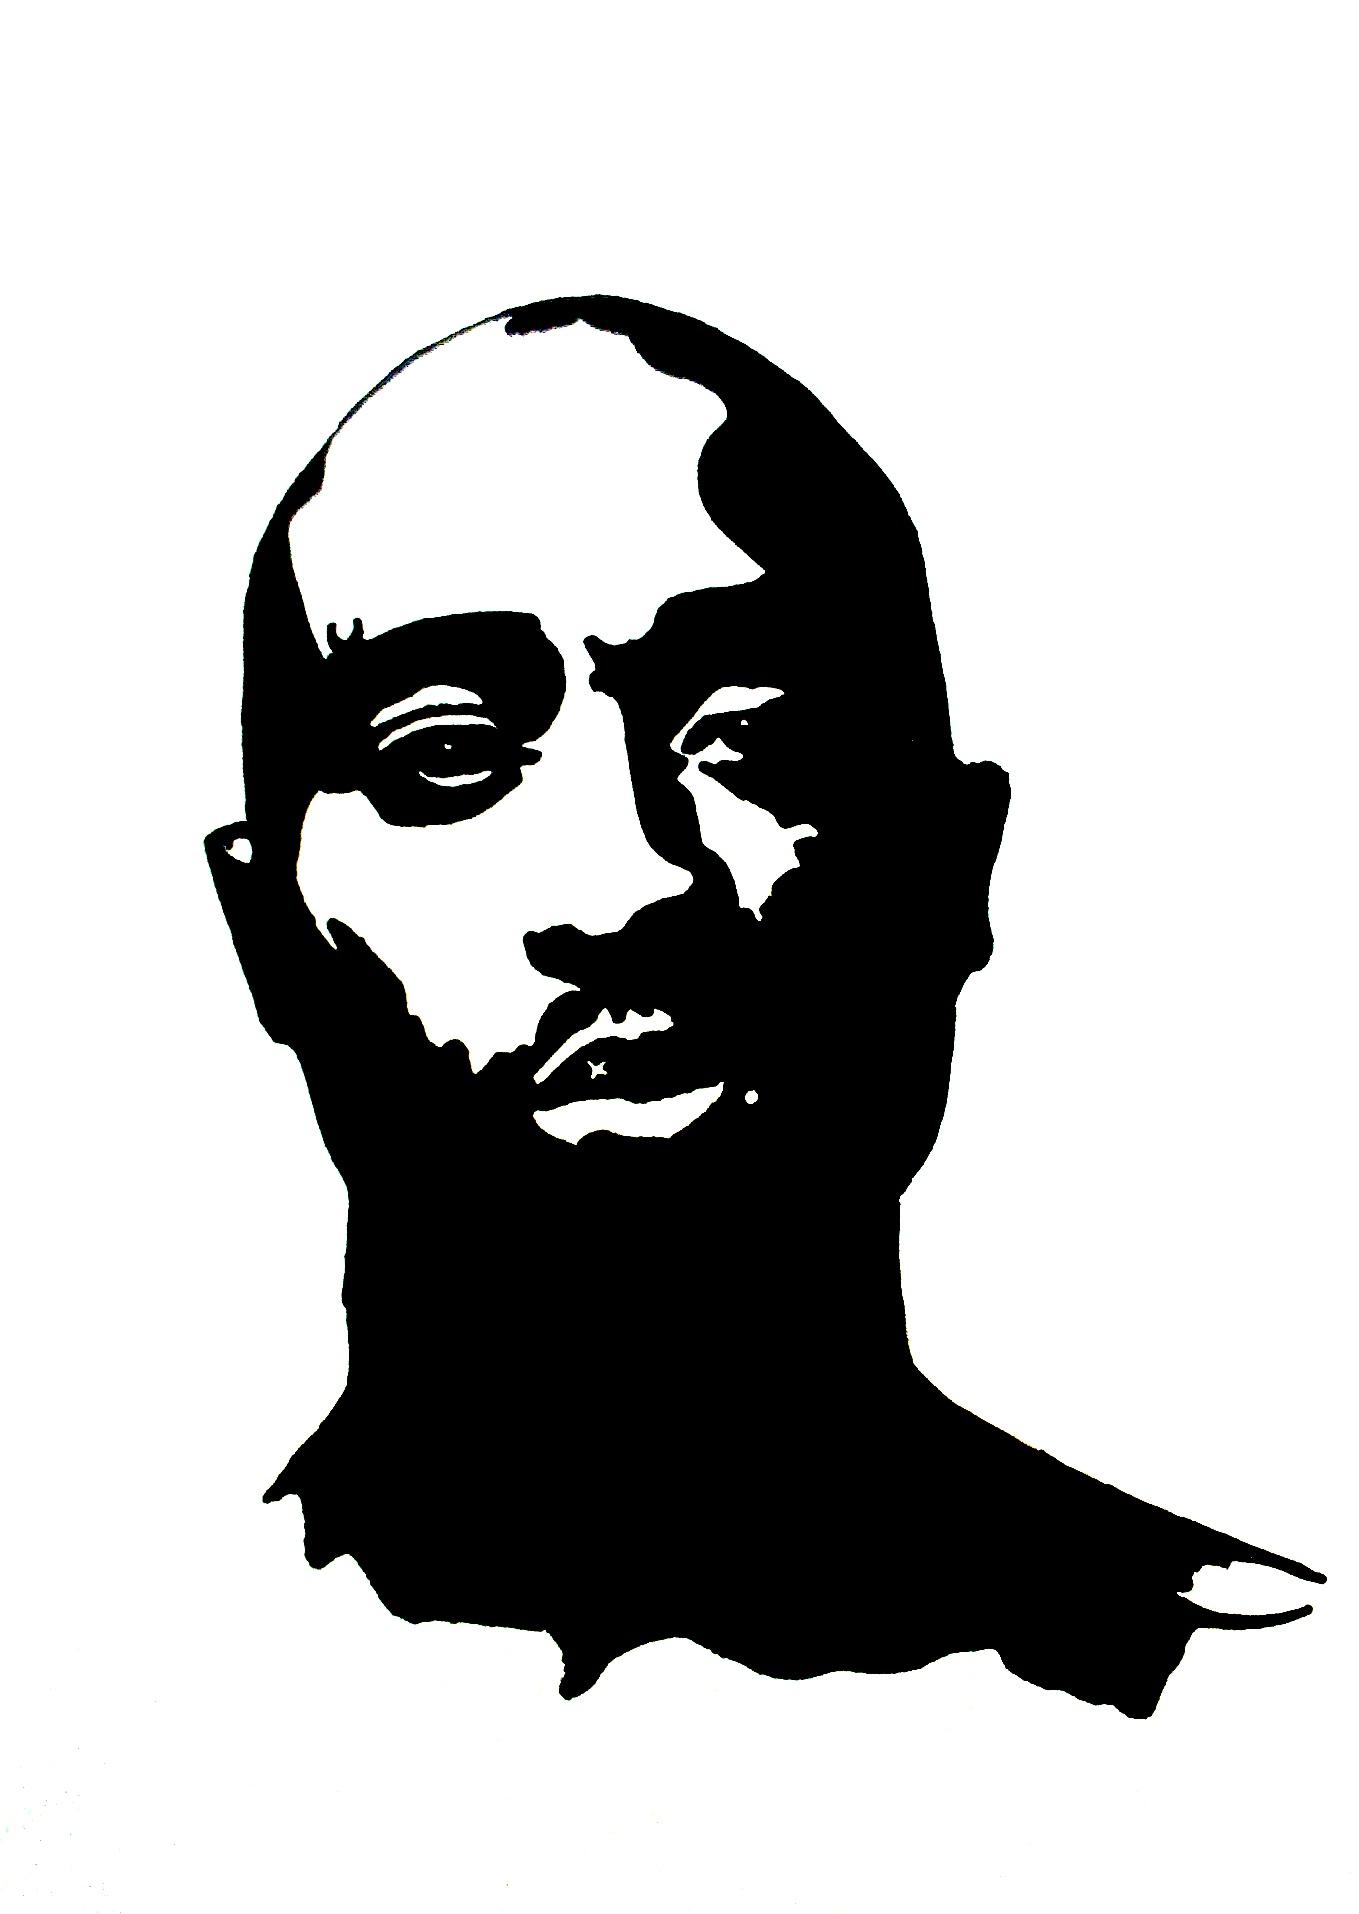 tupac artwork 9 by 00makaveli00 on deviantart